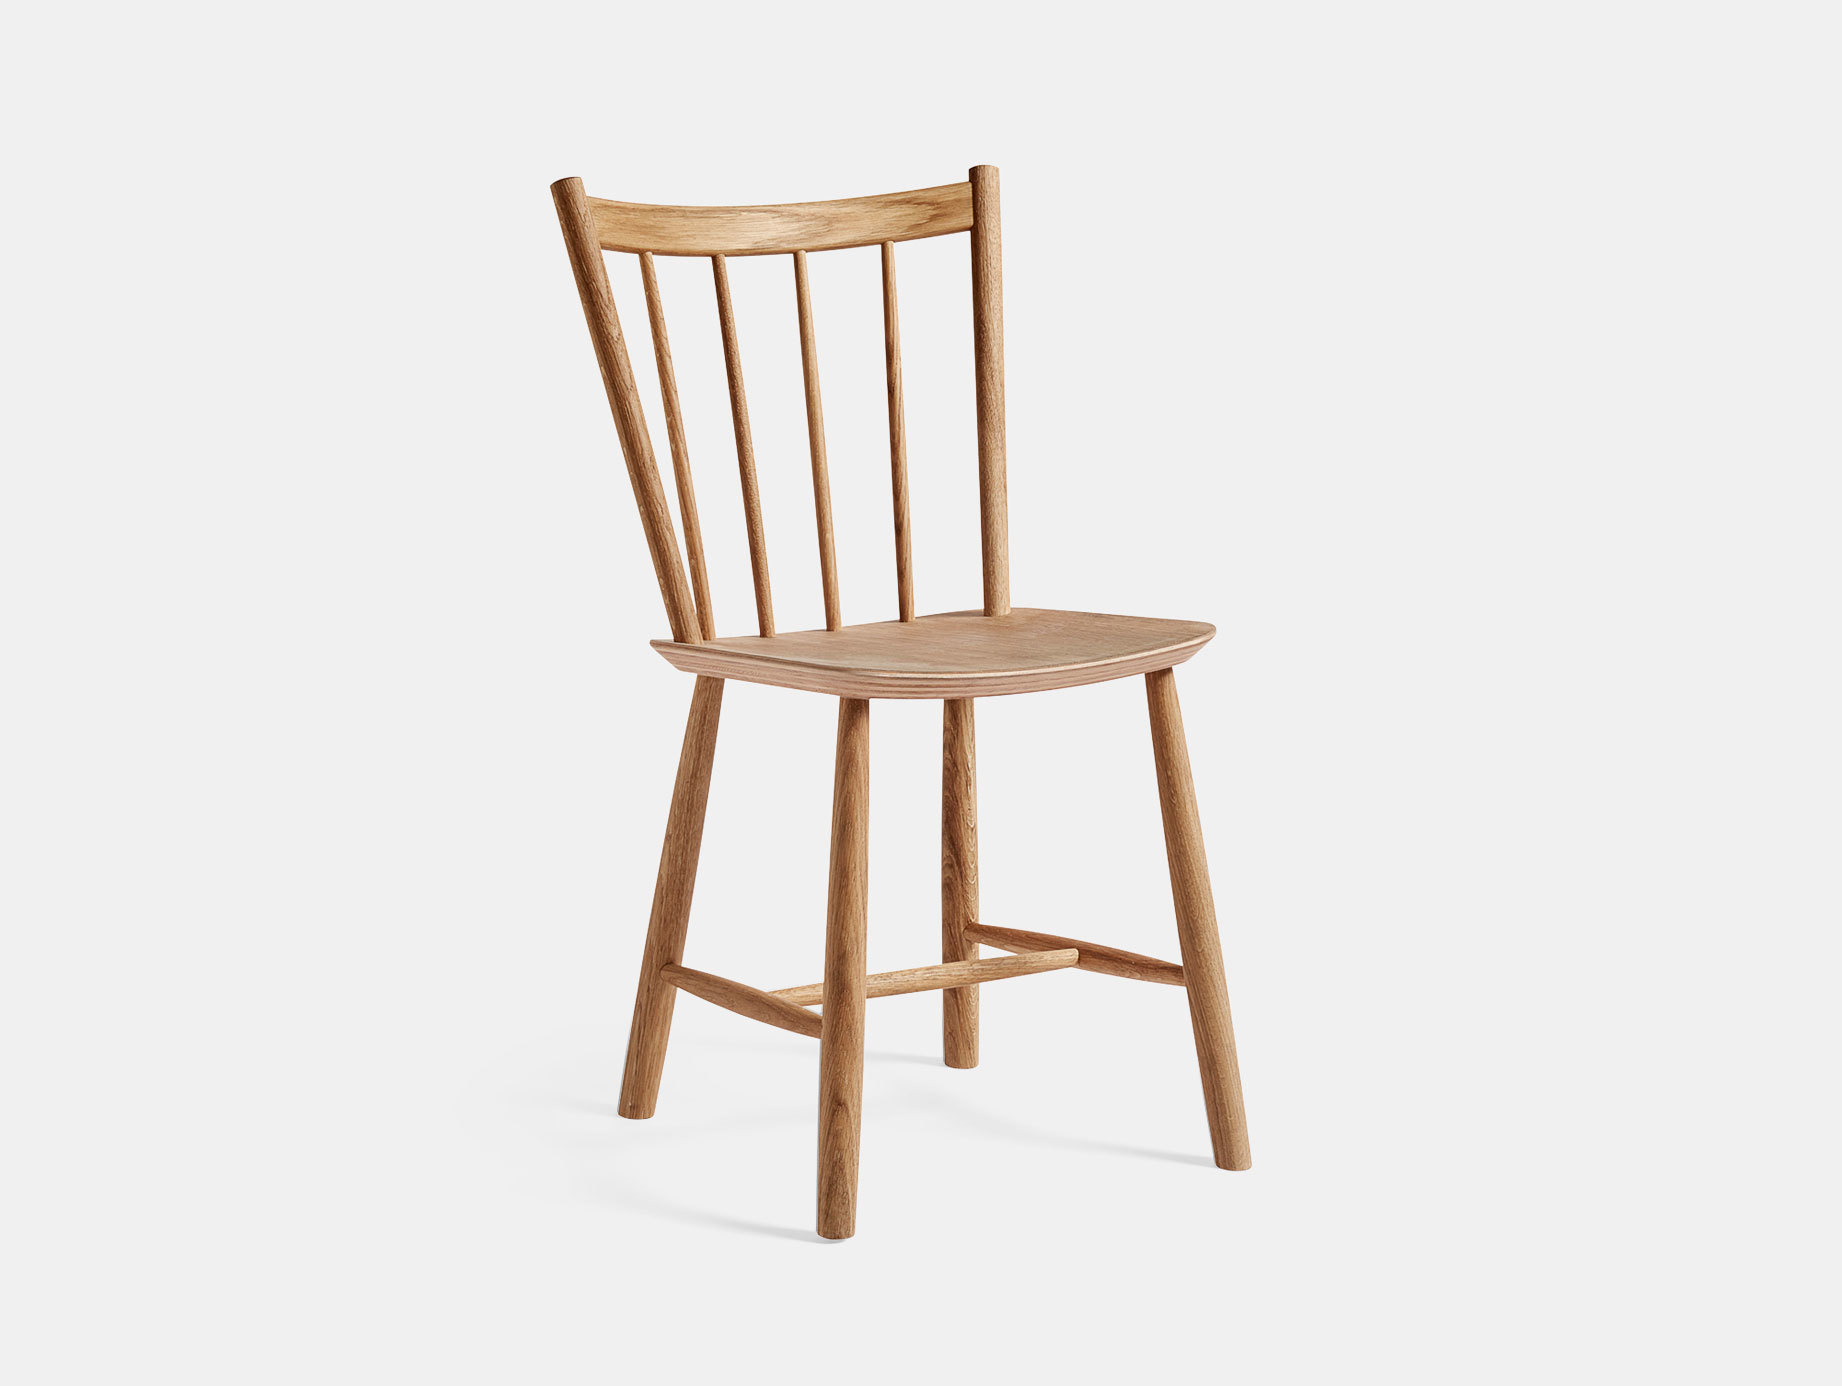 J41 Chair image 2